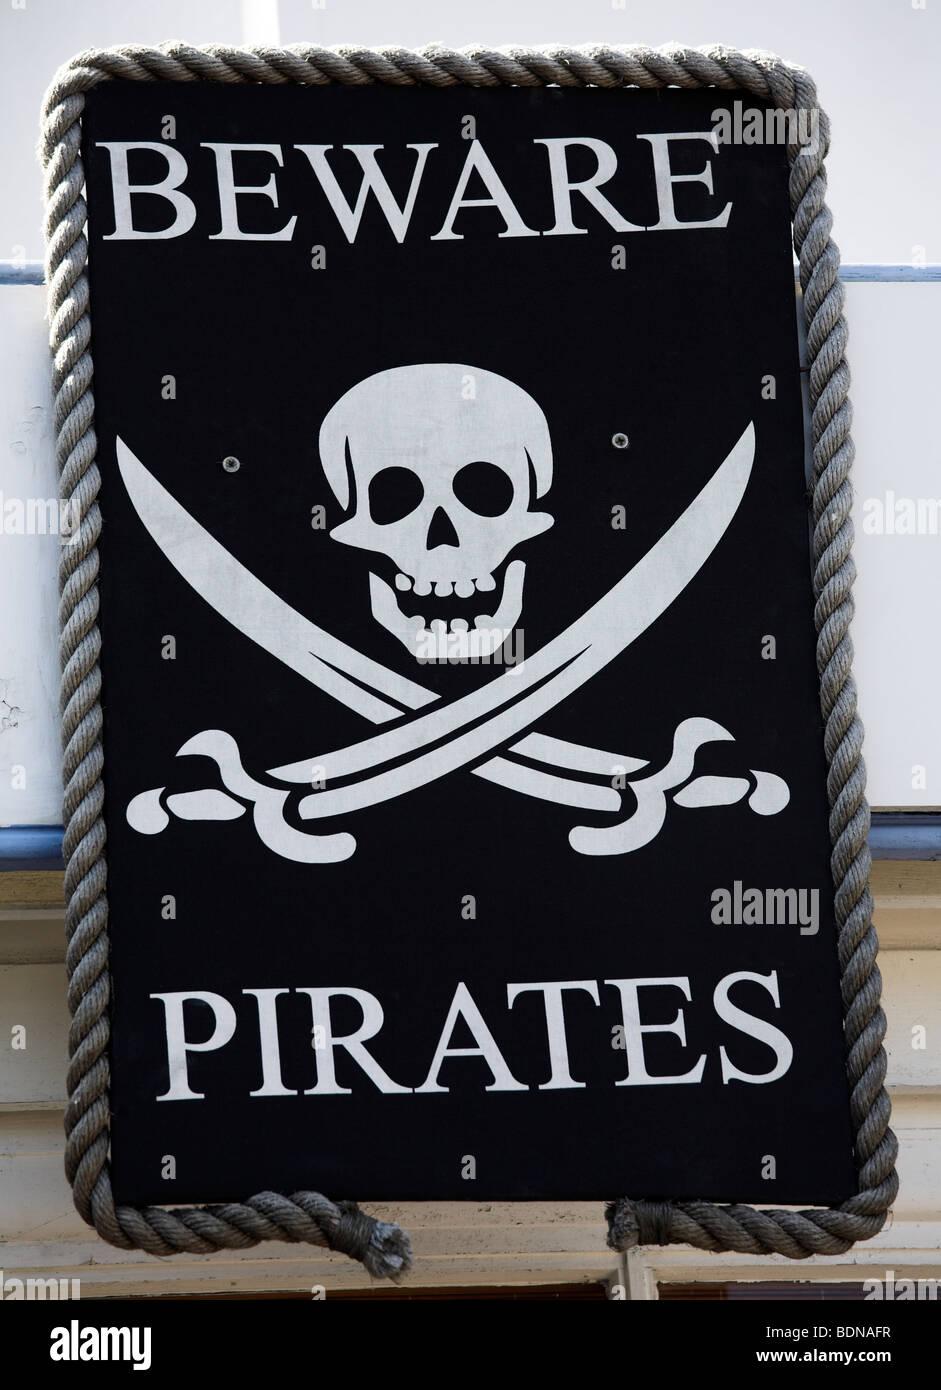 Beware pirates - Stock Image